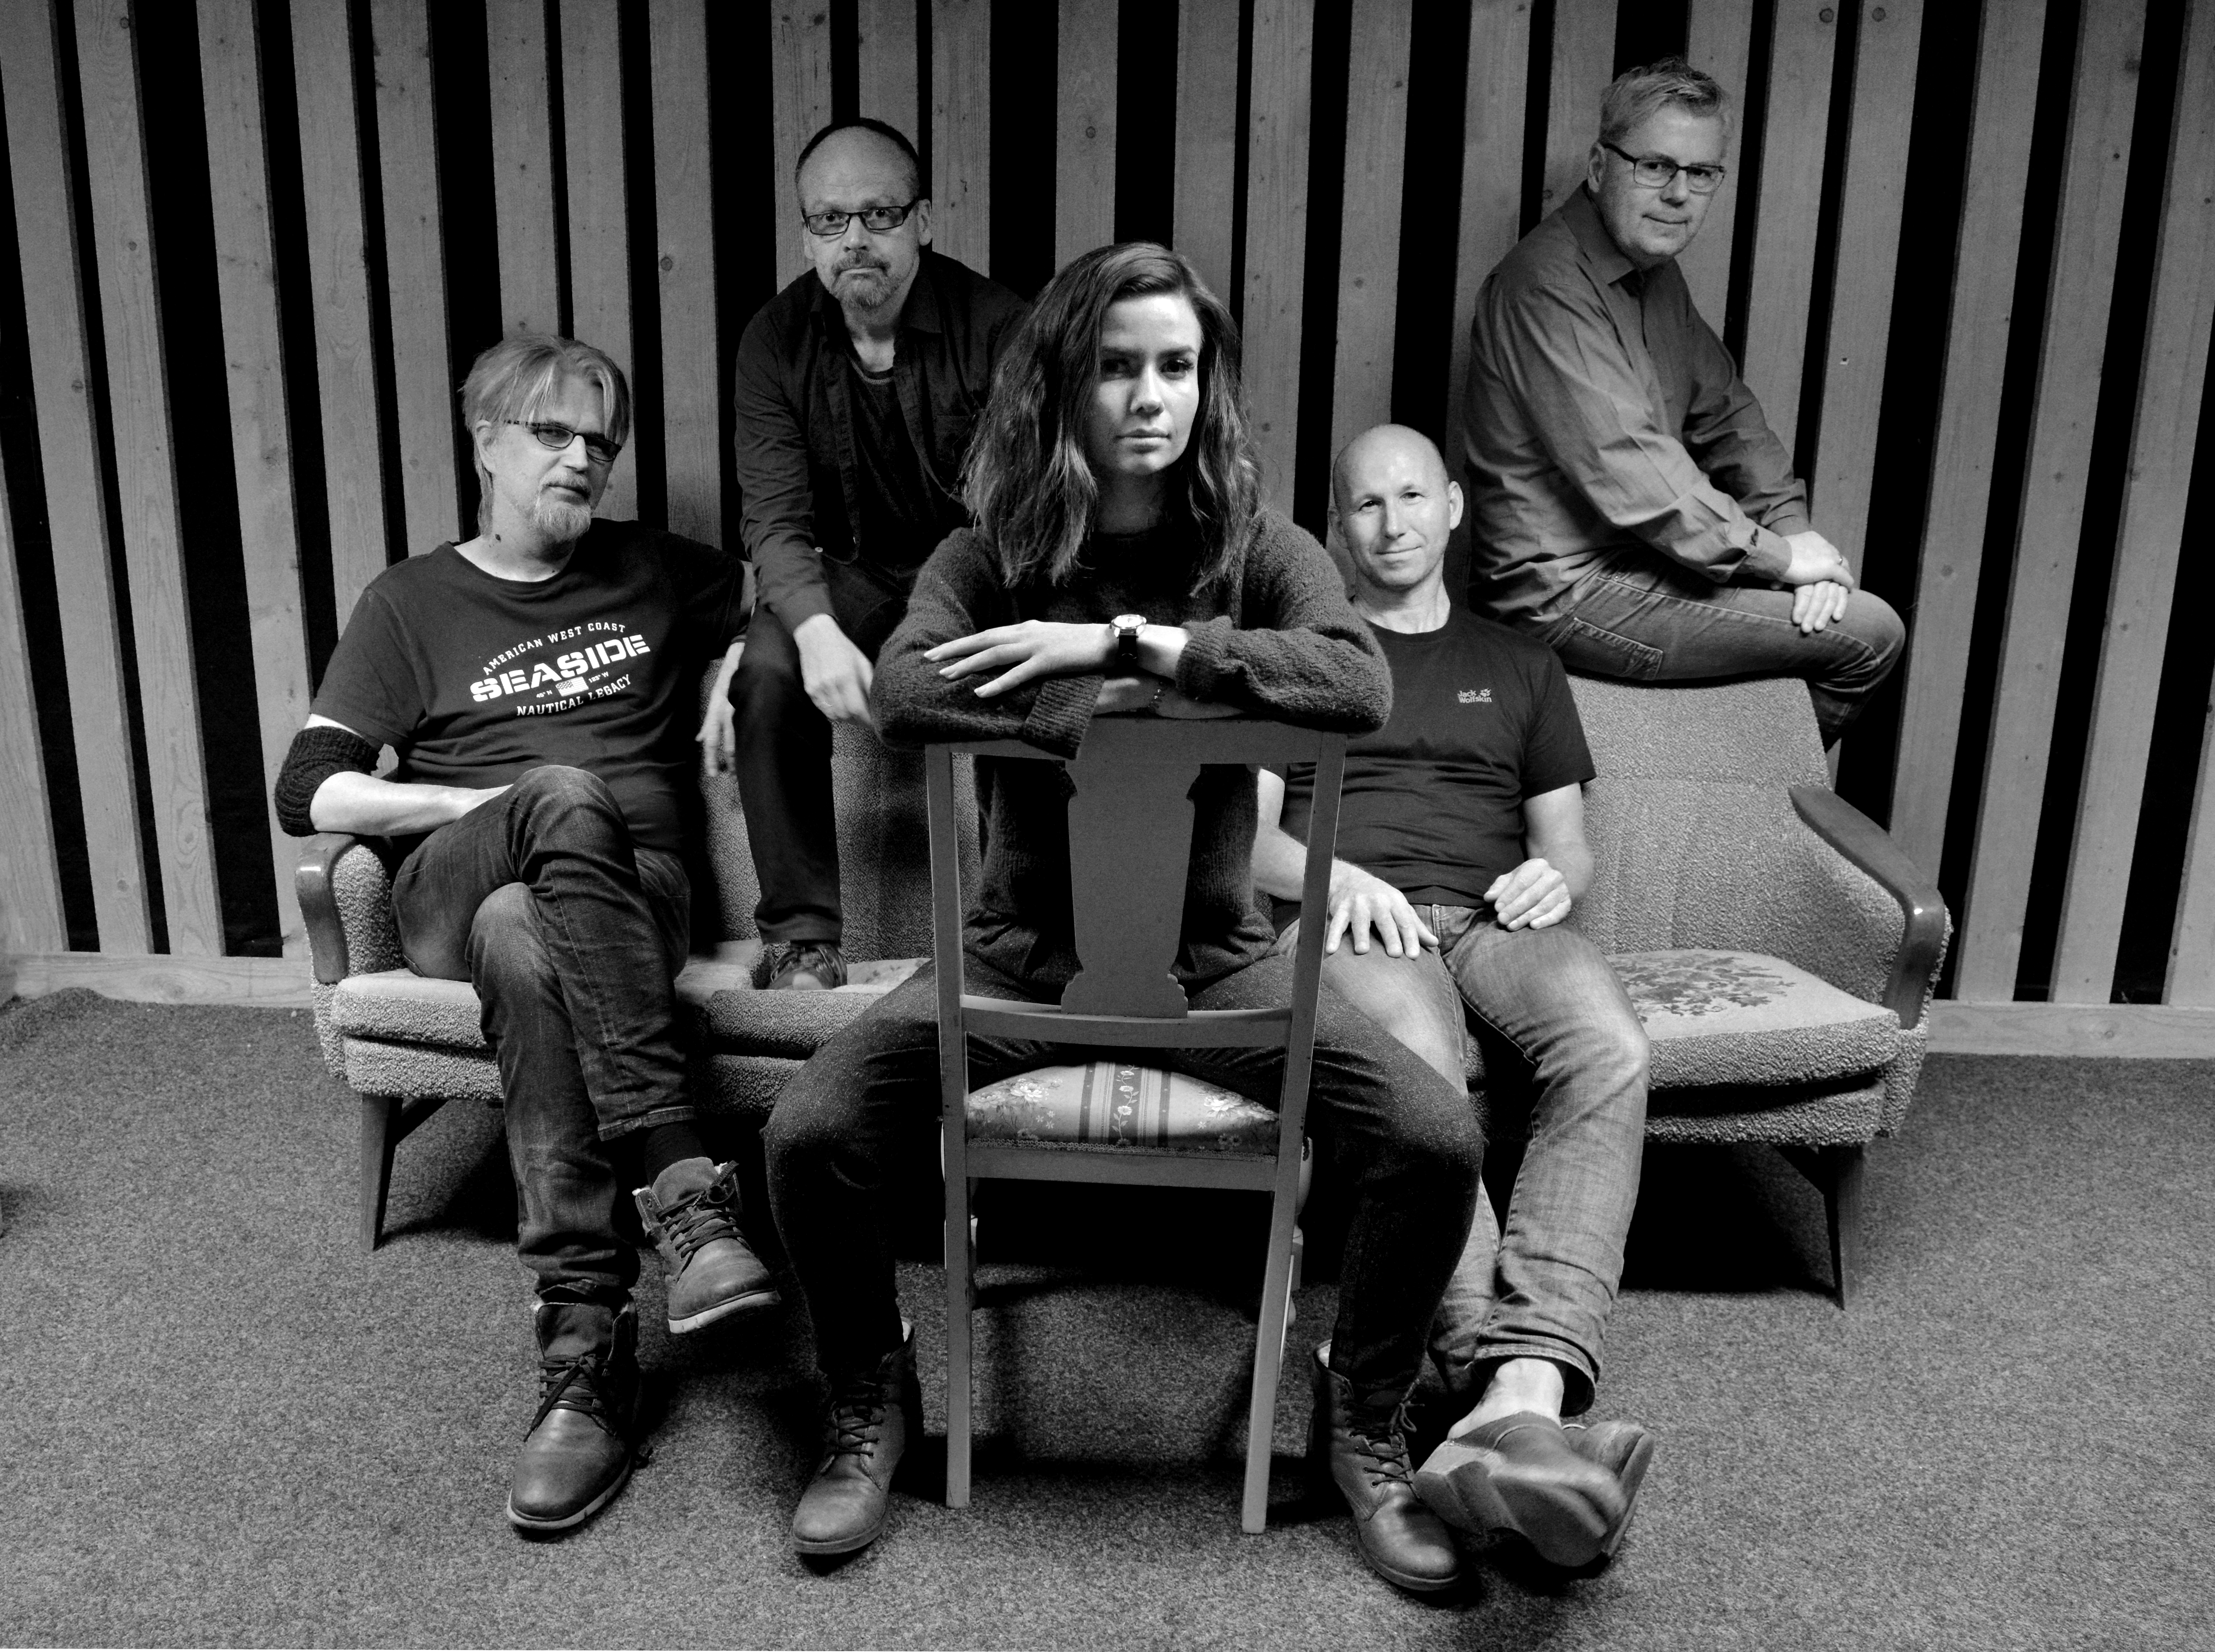 Veracruz: (Fra venstre) Arild Eriksen, John Arne Paulsen, Sofie Almåsvold, Harald Bach-Gansmo og Per Stokkebryn. Foto: Veracruz